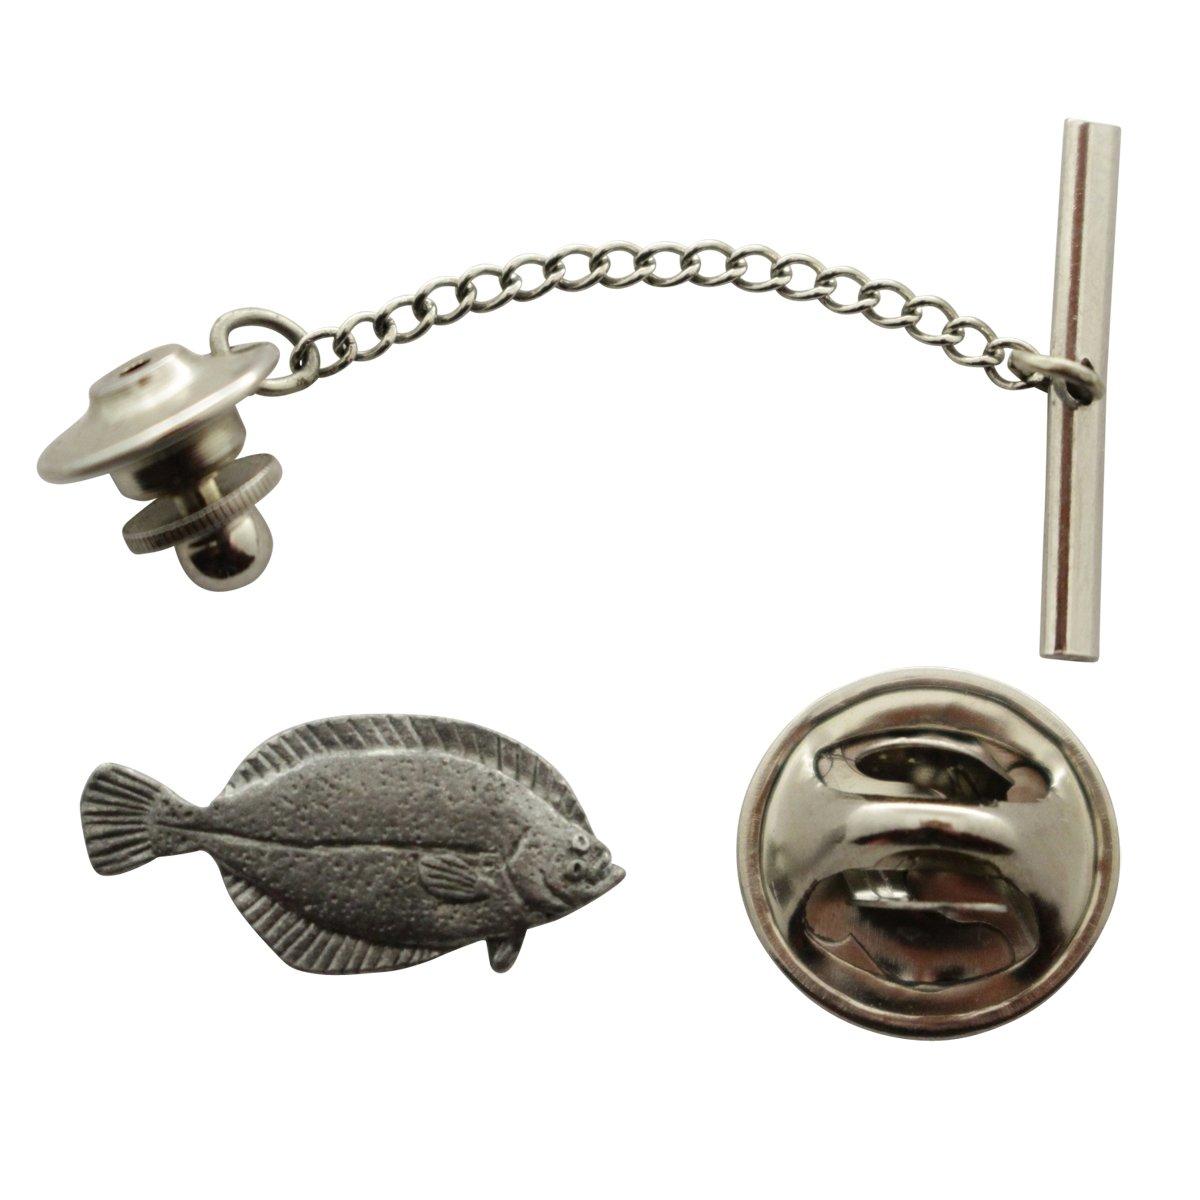 Flounder Tie Tack ~ Antiqued Pewter ~ Tie Tack or Pin ~ Sarah's Treats & Treasures